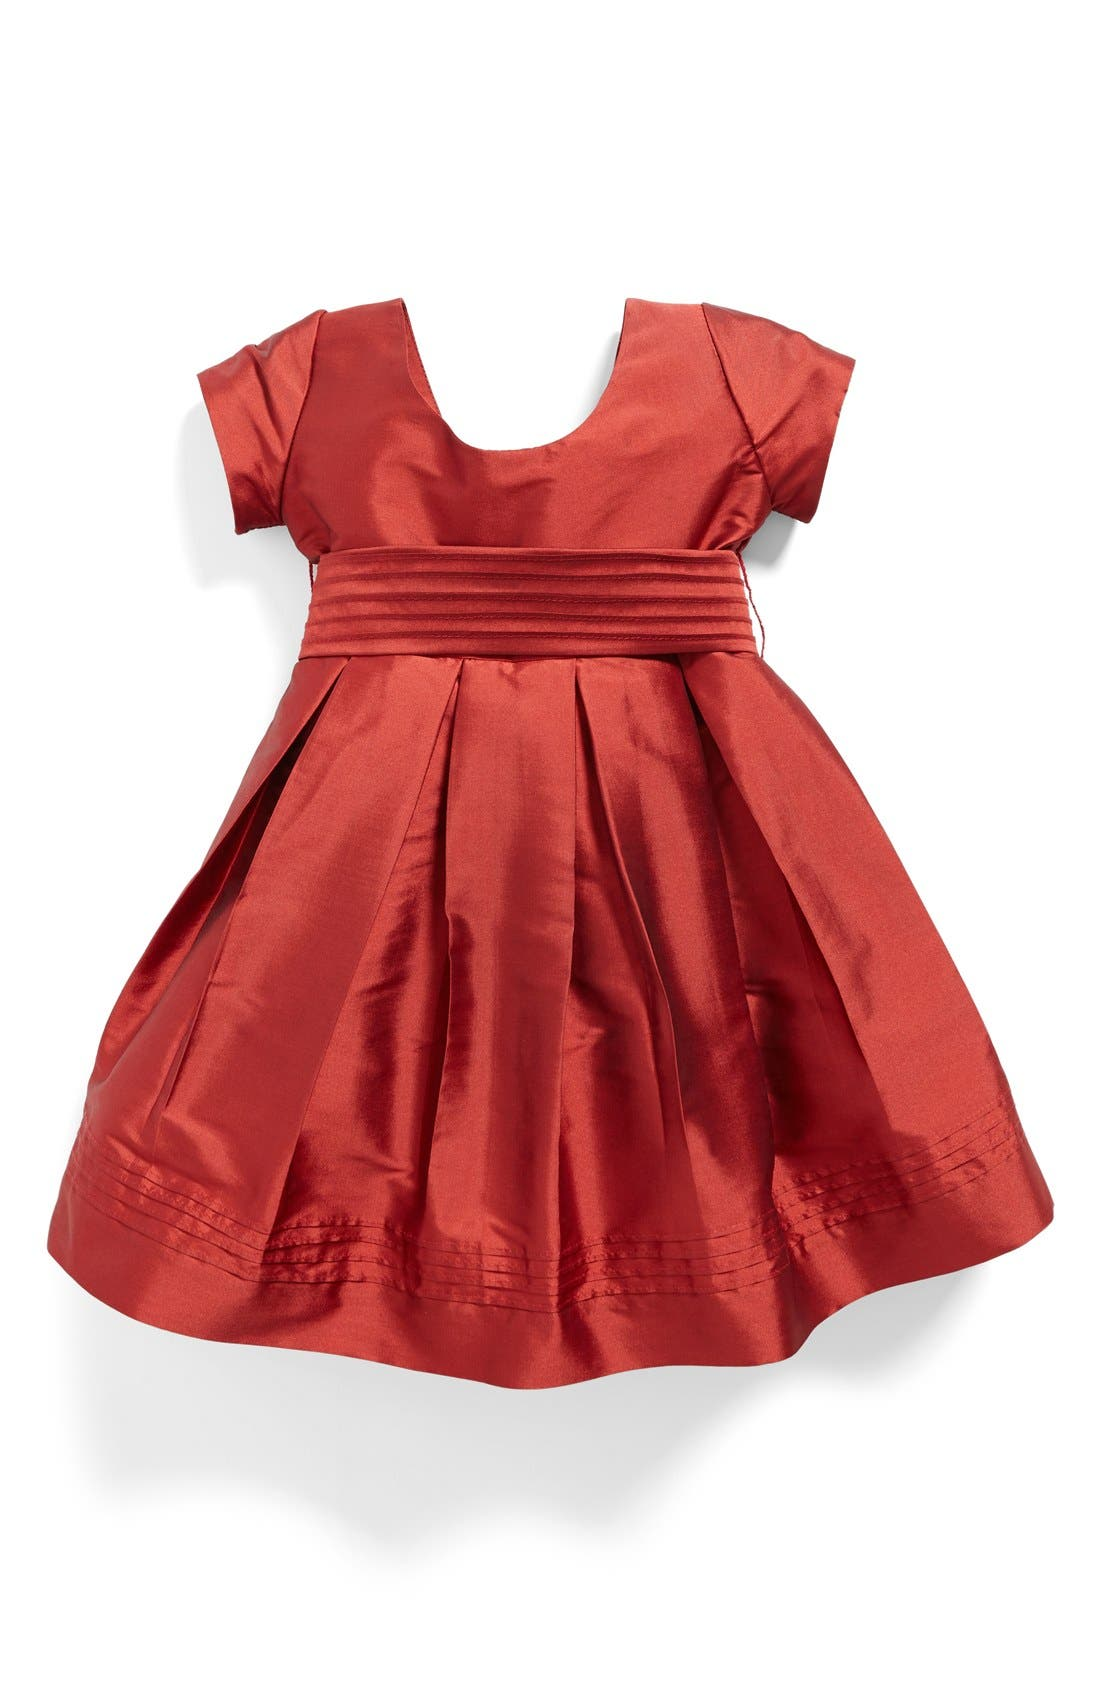 Alternate Image 1 Selected - Isabel GarretonCap Sleeve Taffeta Dress (Toddler Girls, Little Girls & Big Girls)